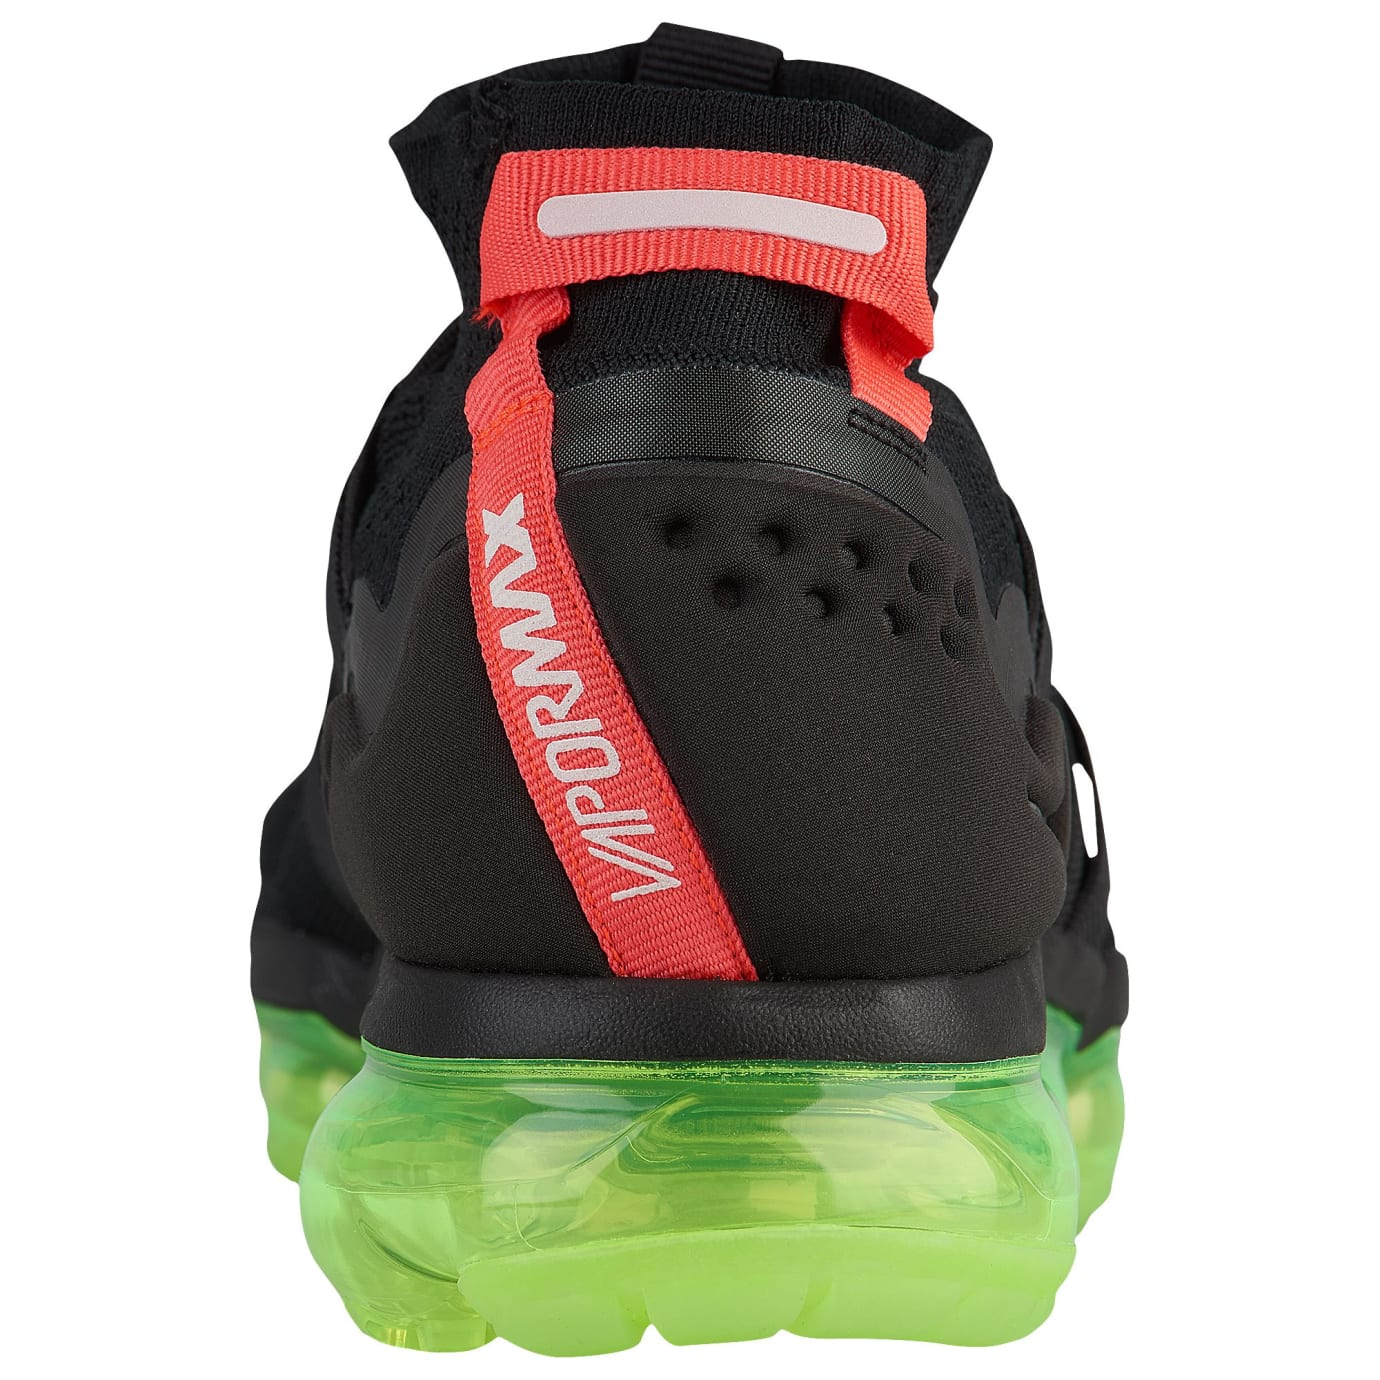 32be00db91 Image via Foot Locker Nike Air VaporMax Flyknit Utility Yeezy Black Volt  Crimson Release Date AH6834-007 Heel